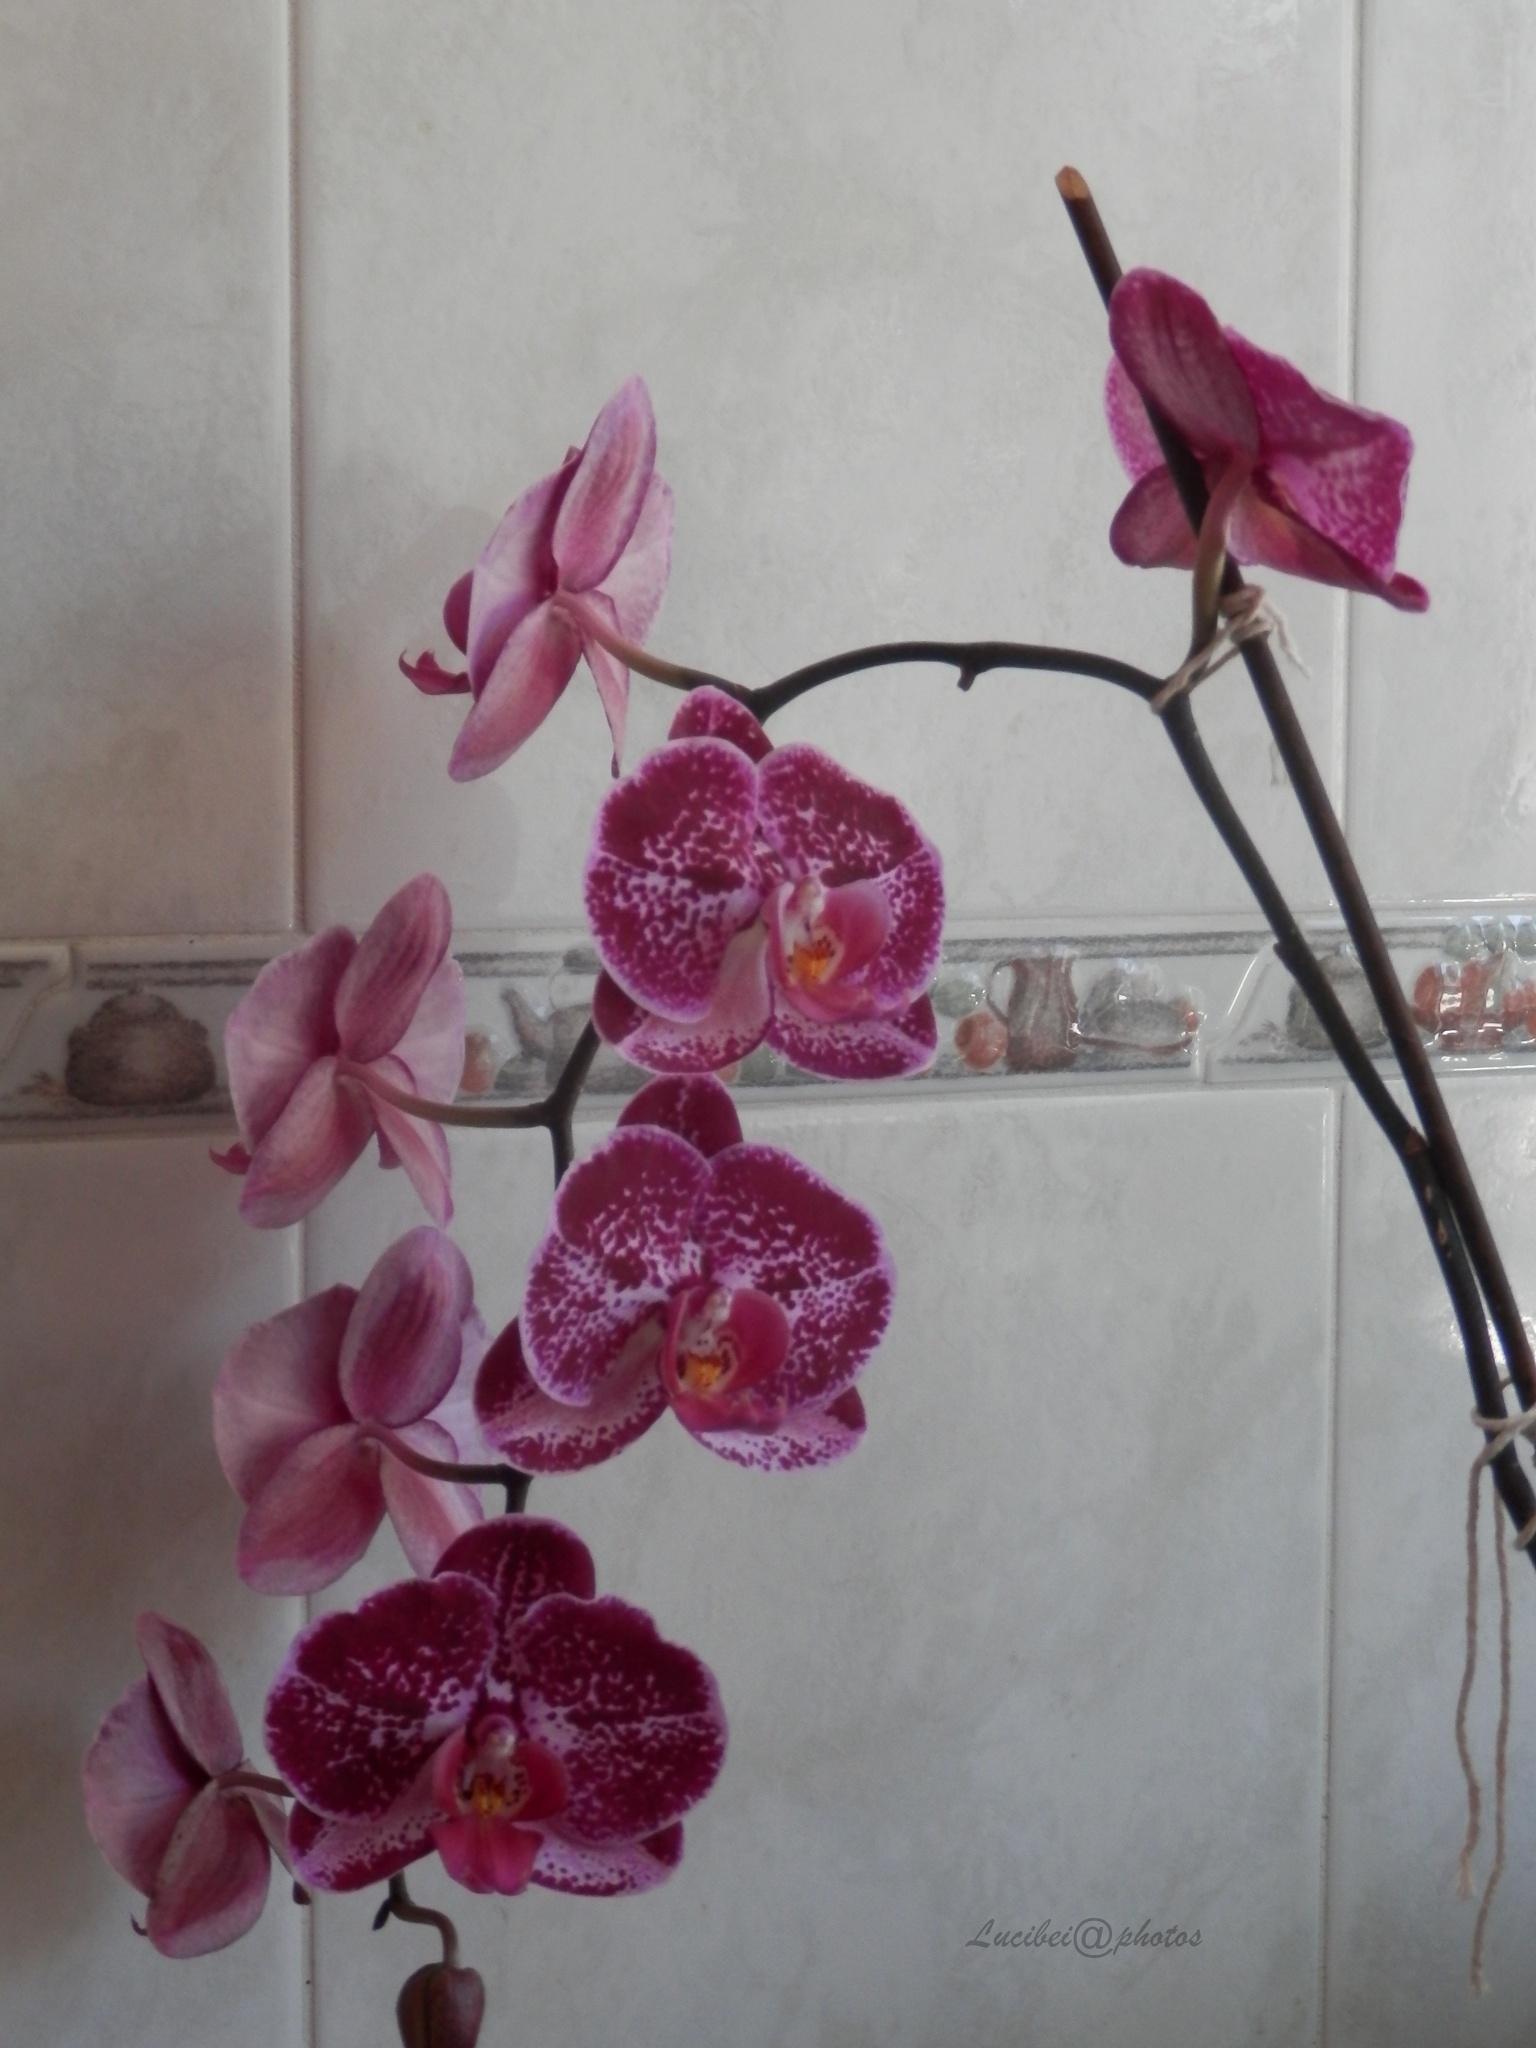 Flowers by lucia.ribeiro.33